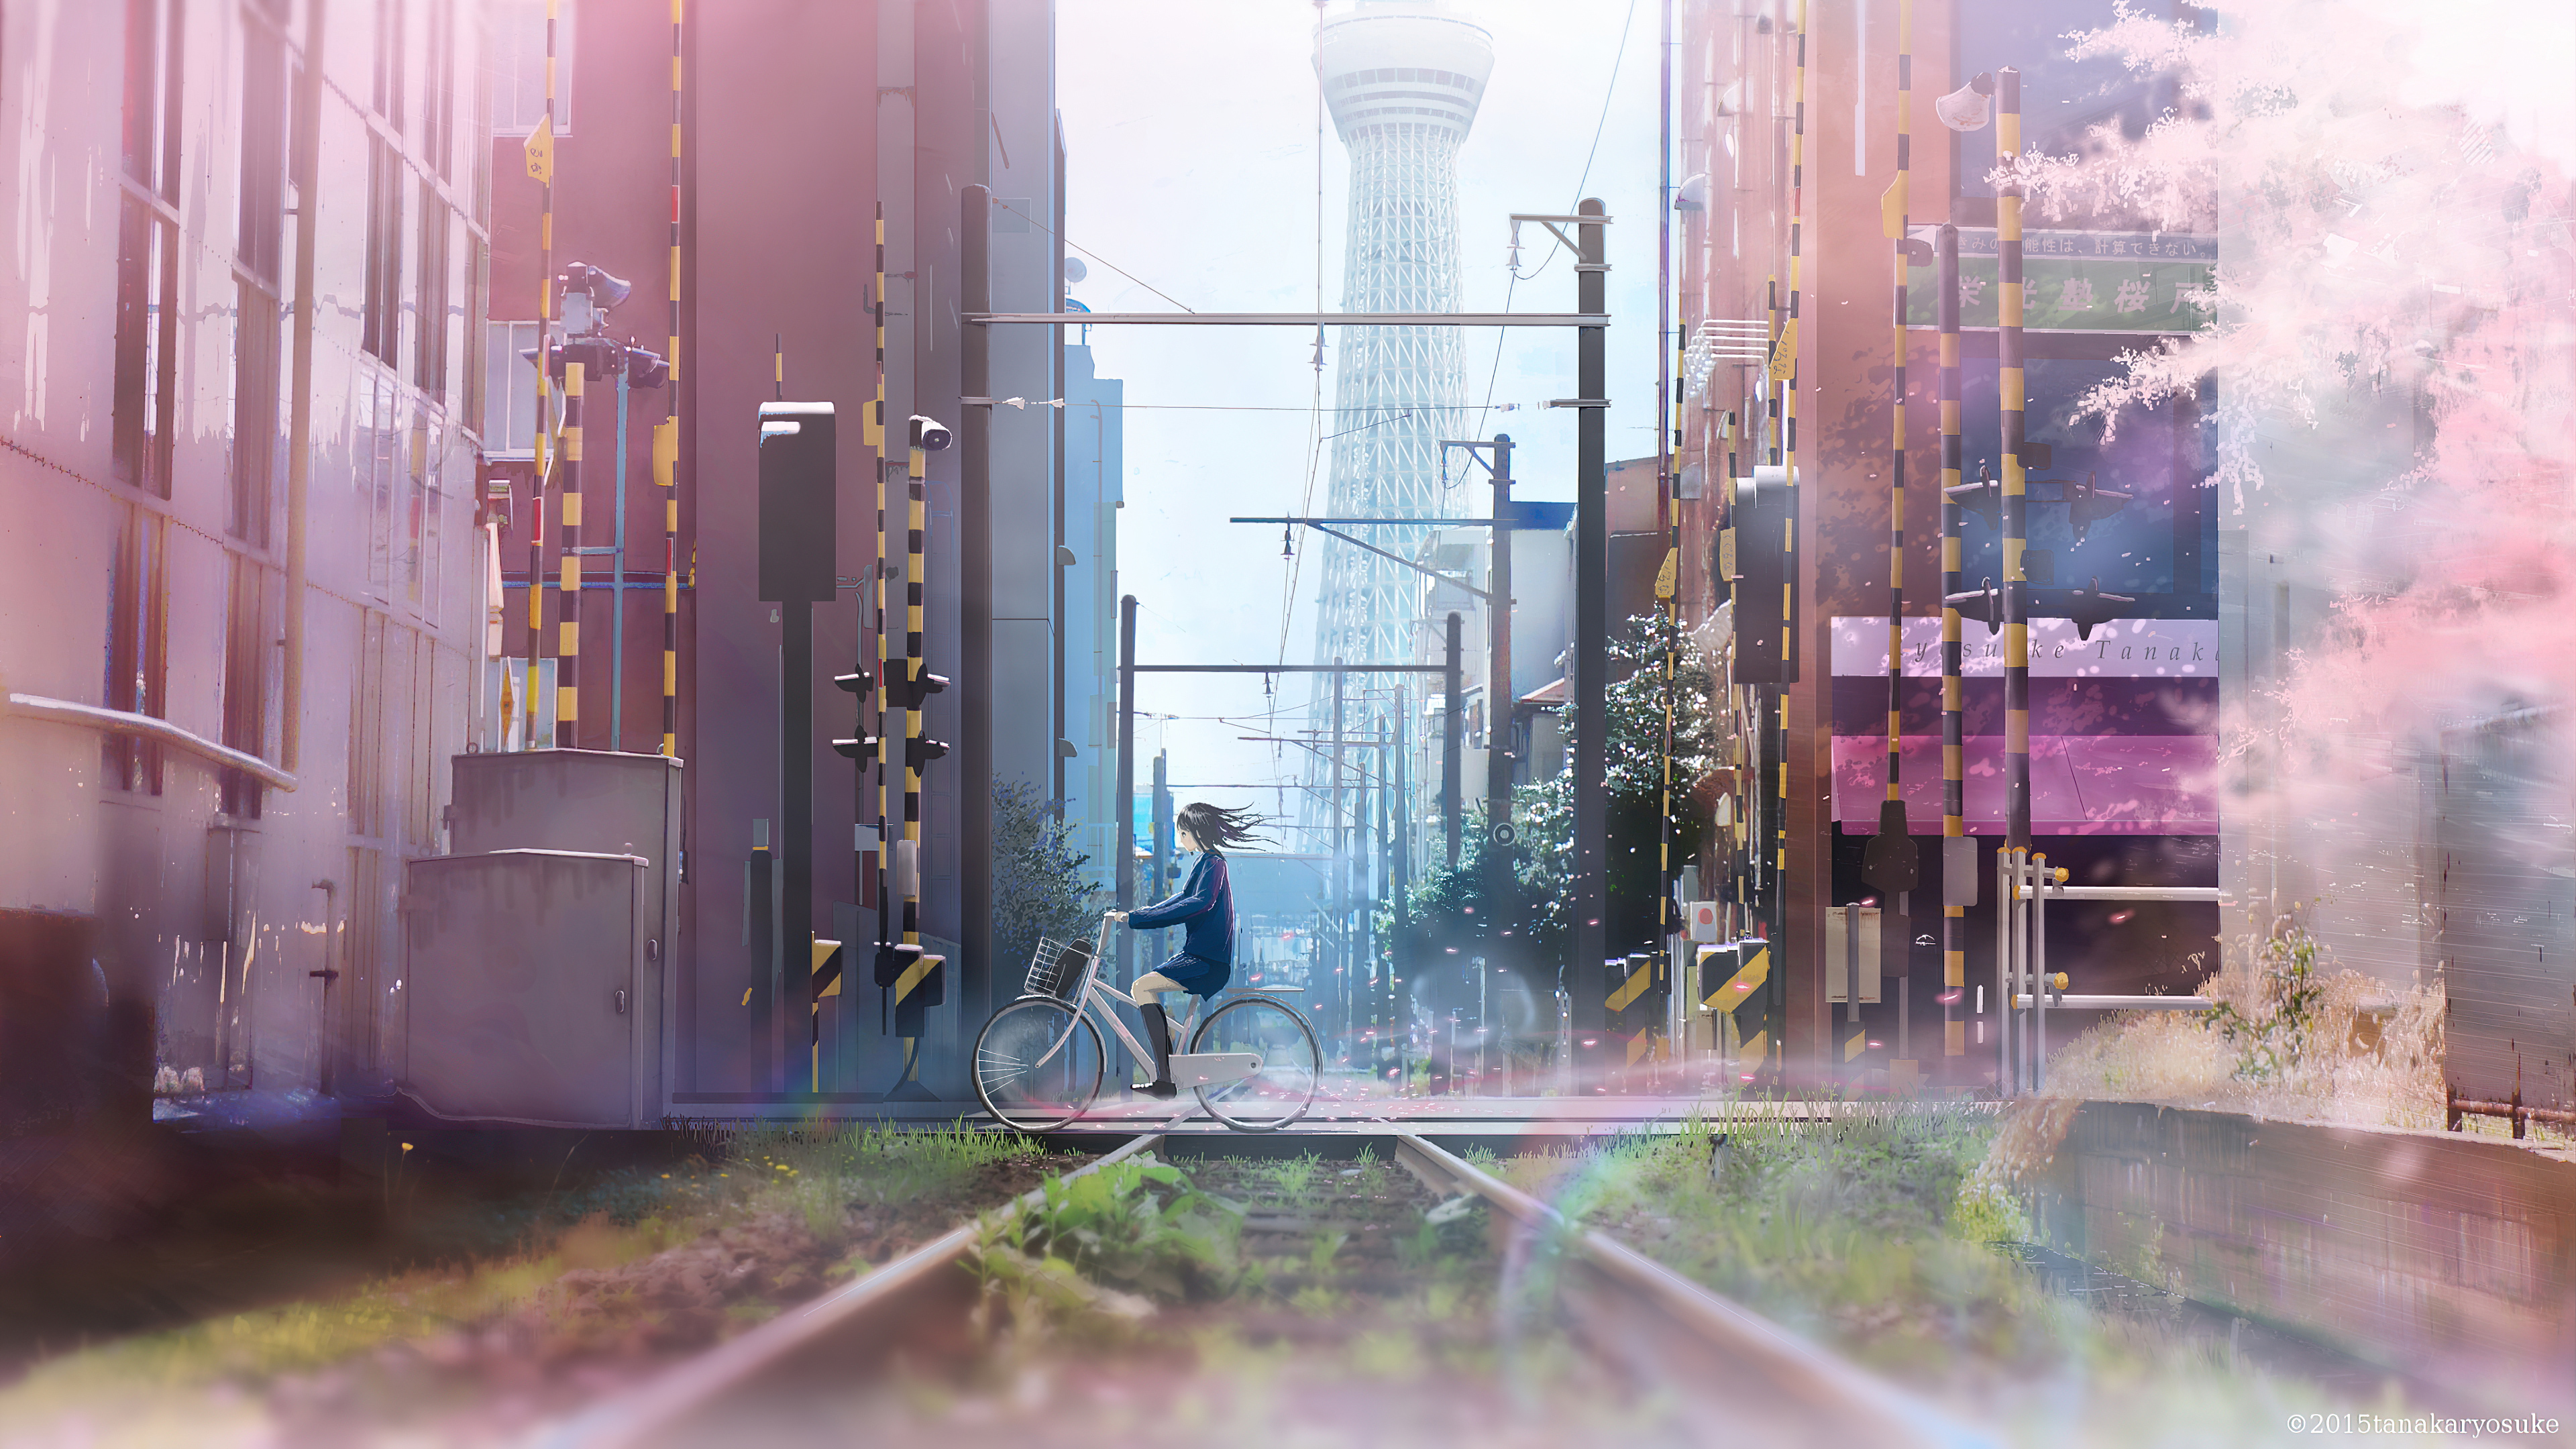 anime girl on bicycle 1596921285 - Anime Girl On Bicycle -